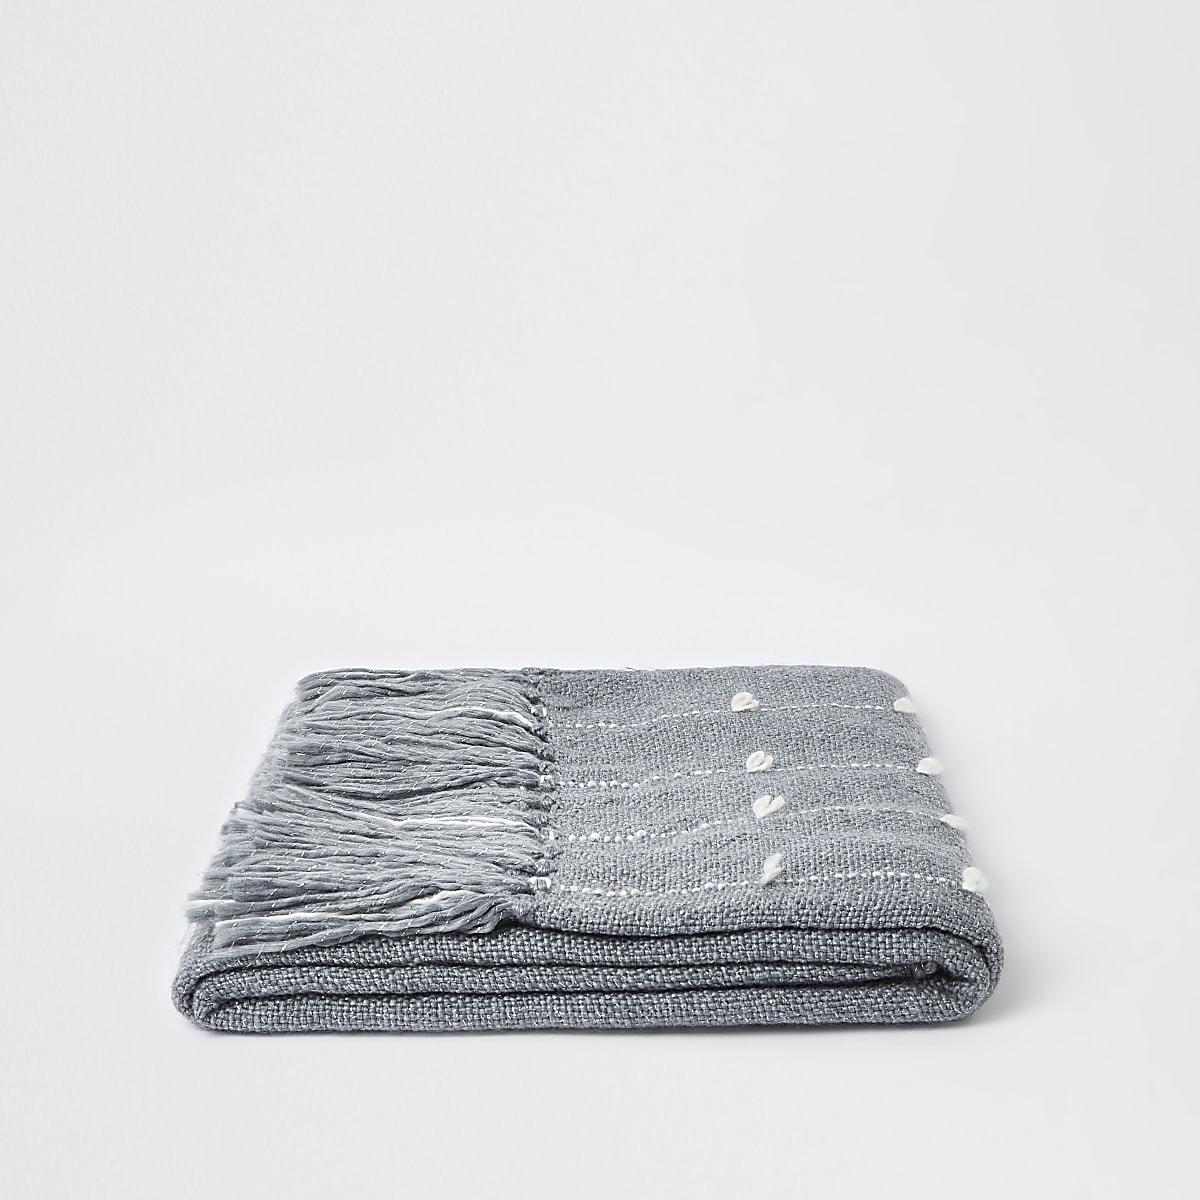 Grey throw with sewn thread detail